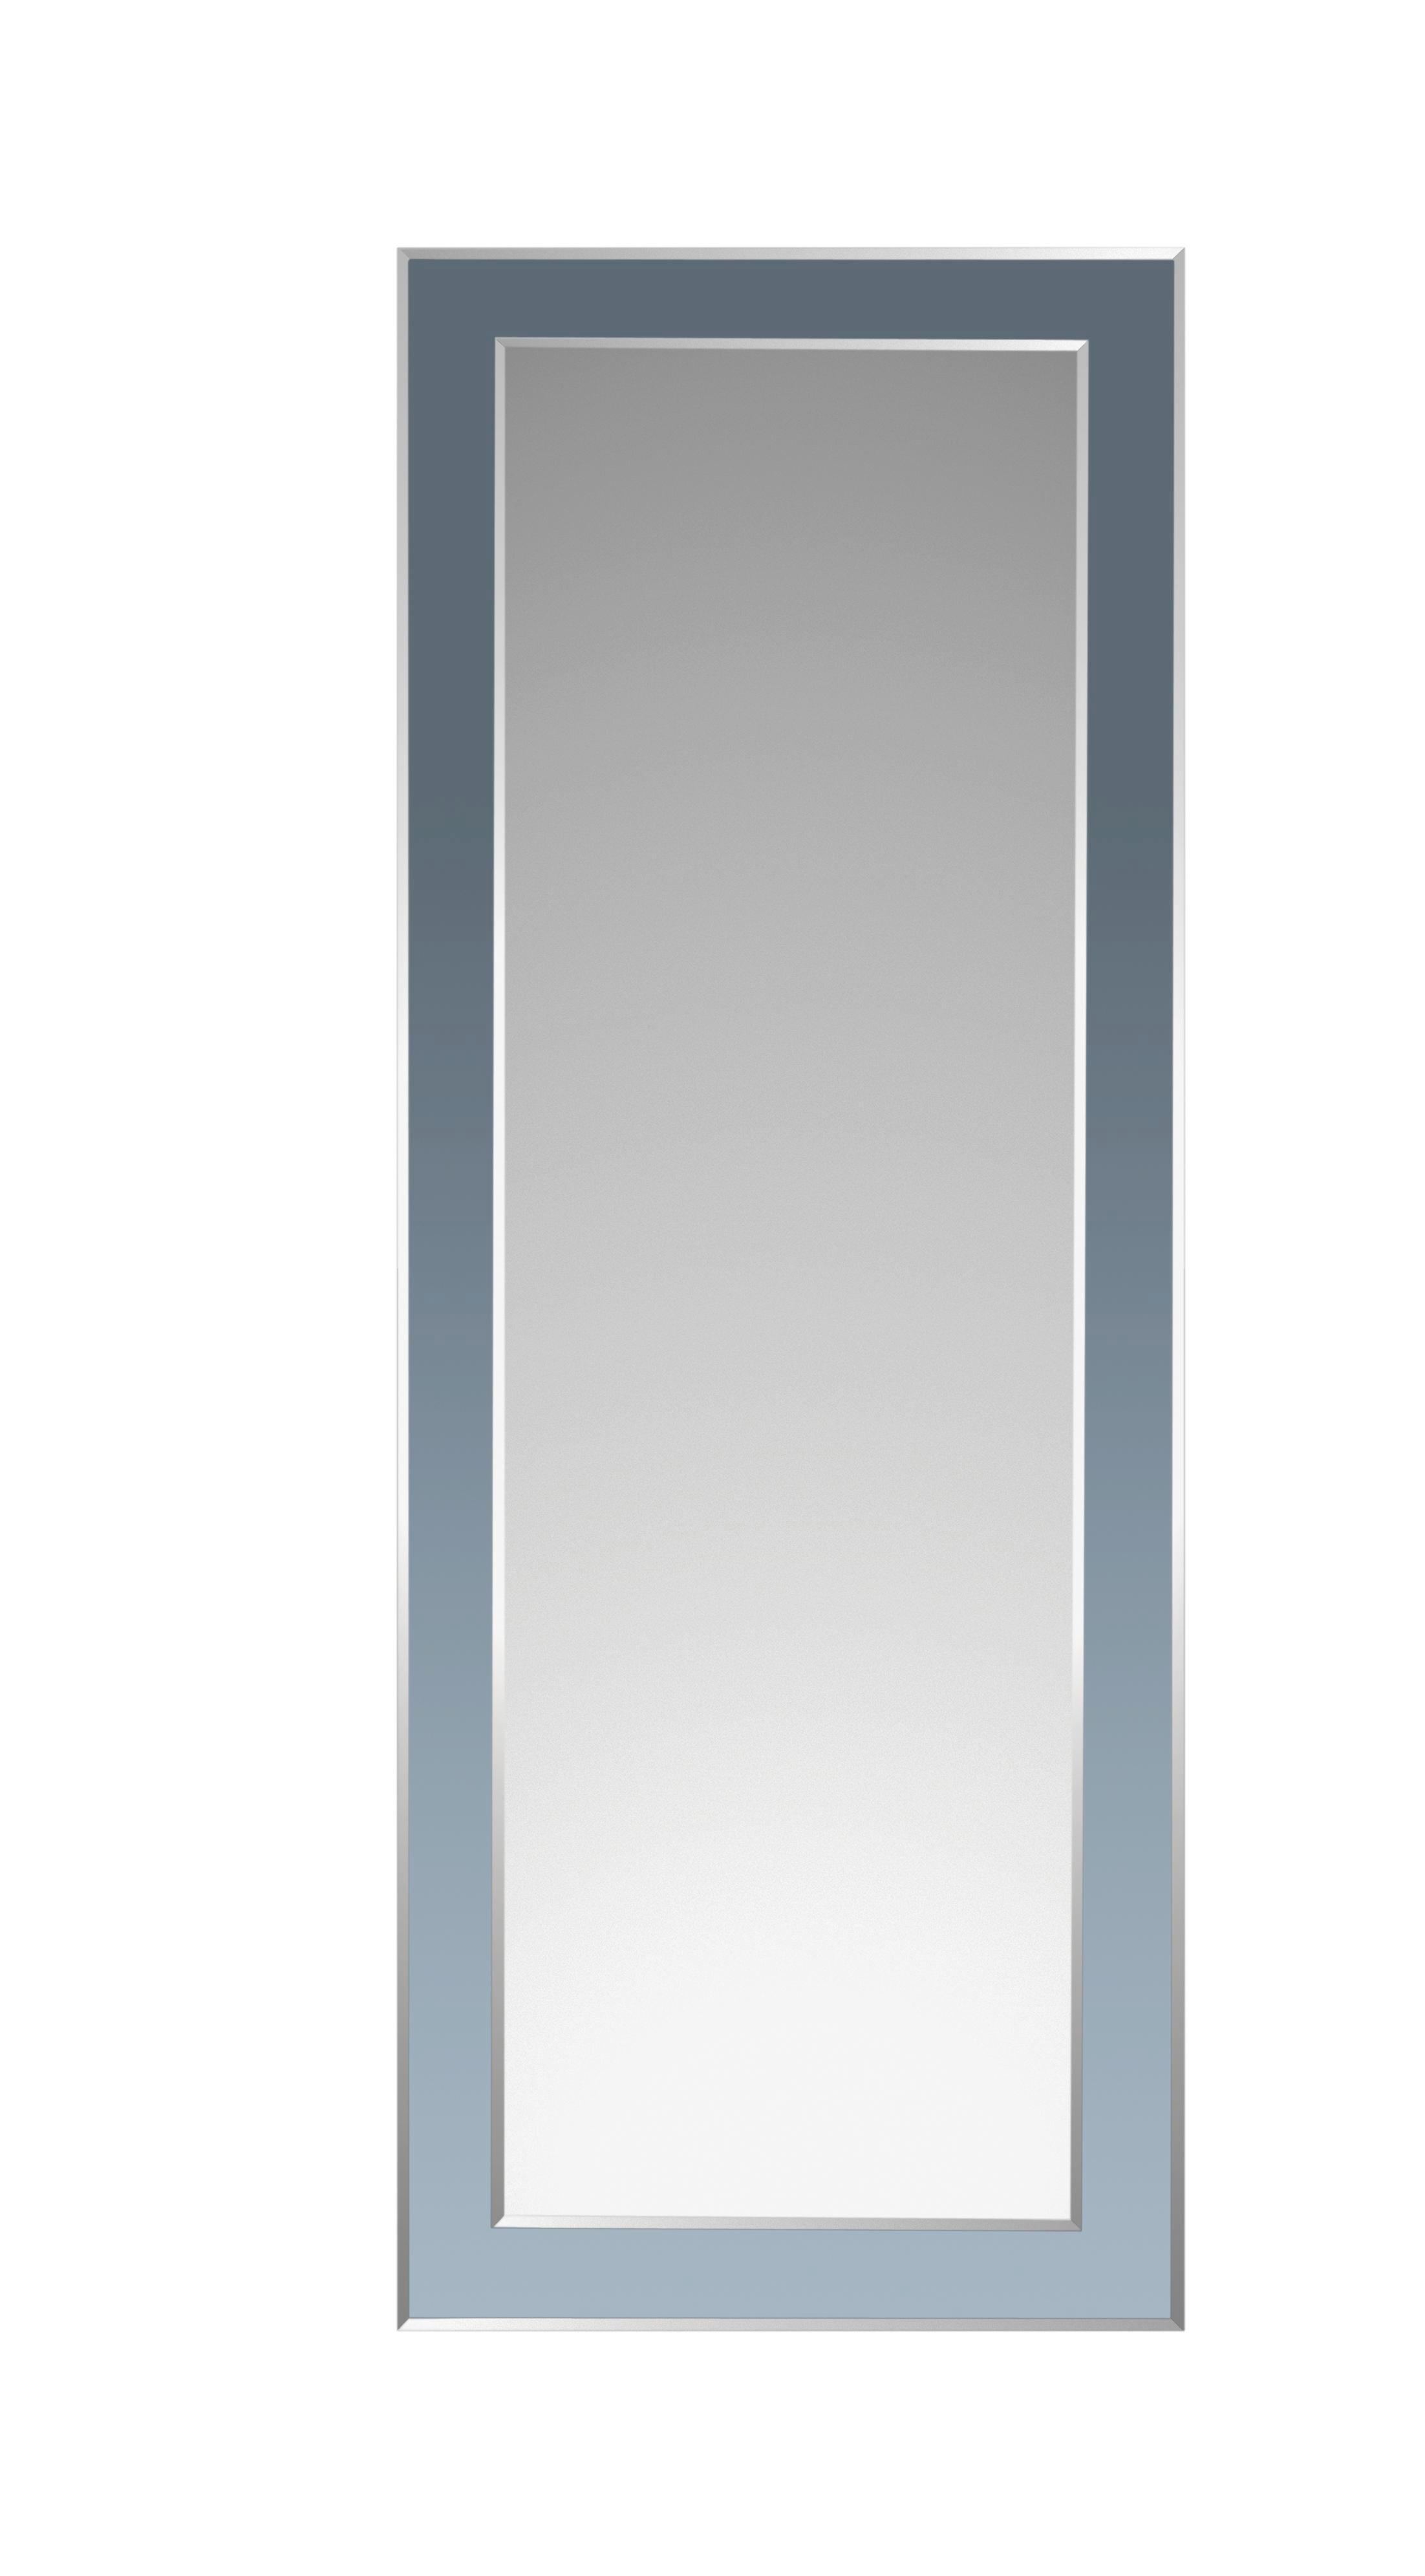 SPEGEL - silver/svart, Design, glas (60/160/1,5cm) - BOXXX